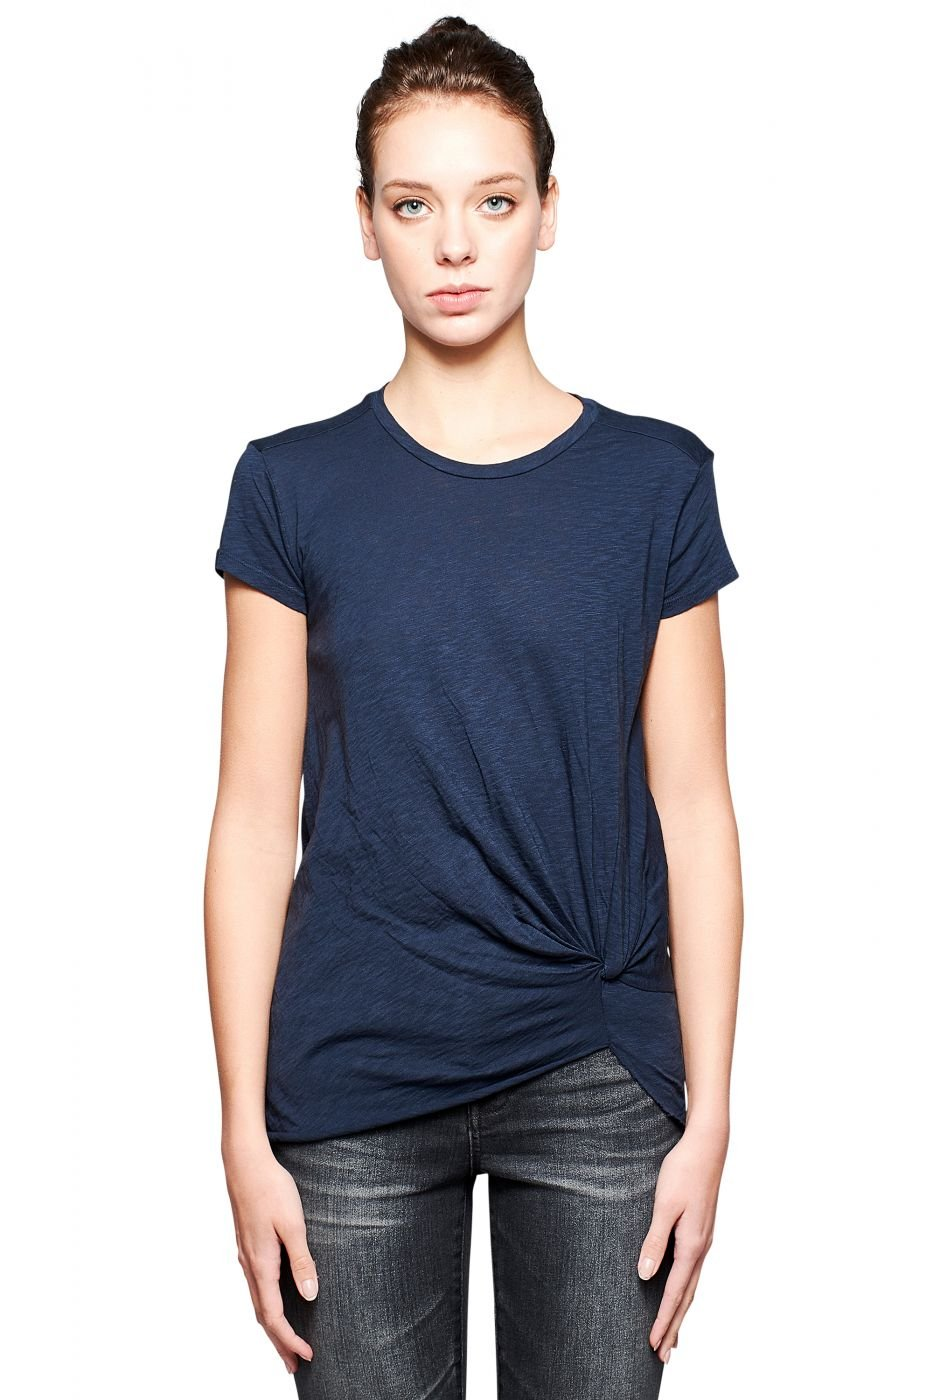 Stateside Women's Slub Jersey Twist Front Short Sleeve Tee, Navy, M